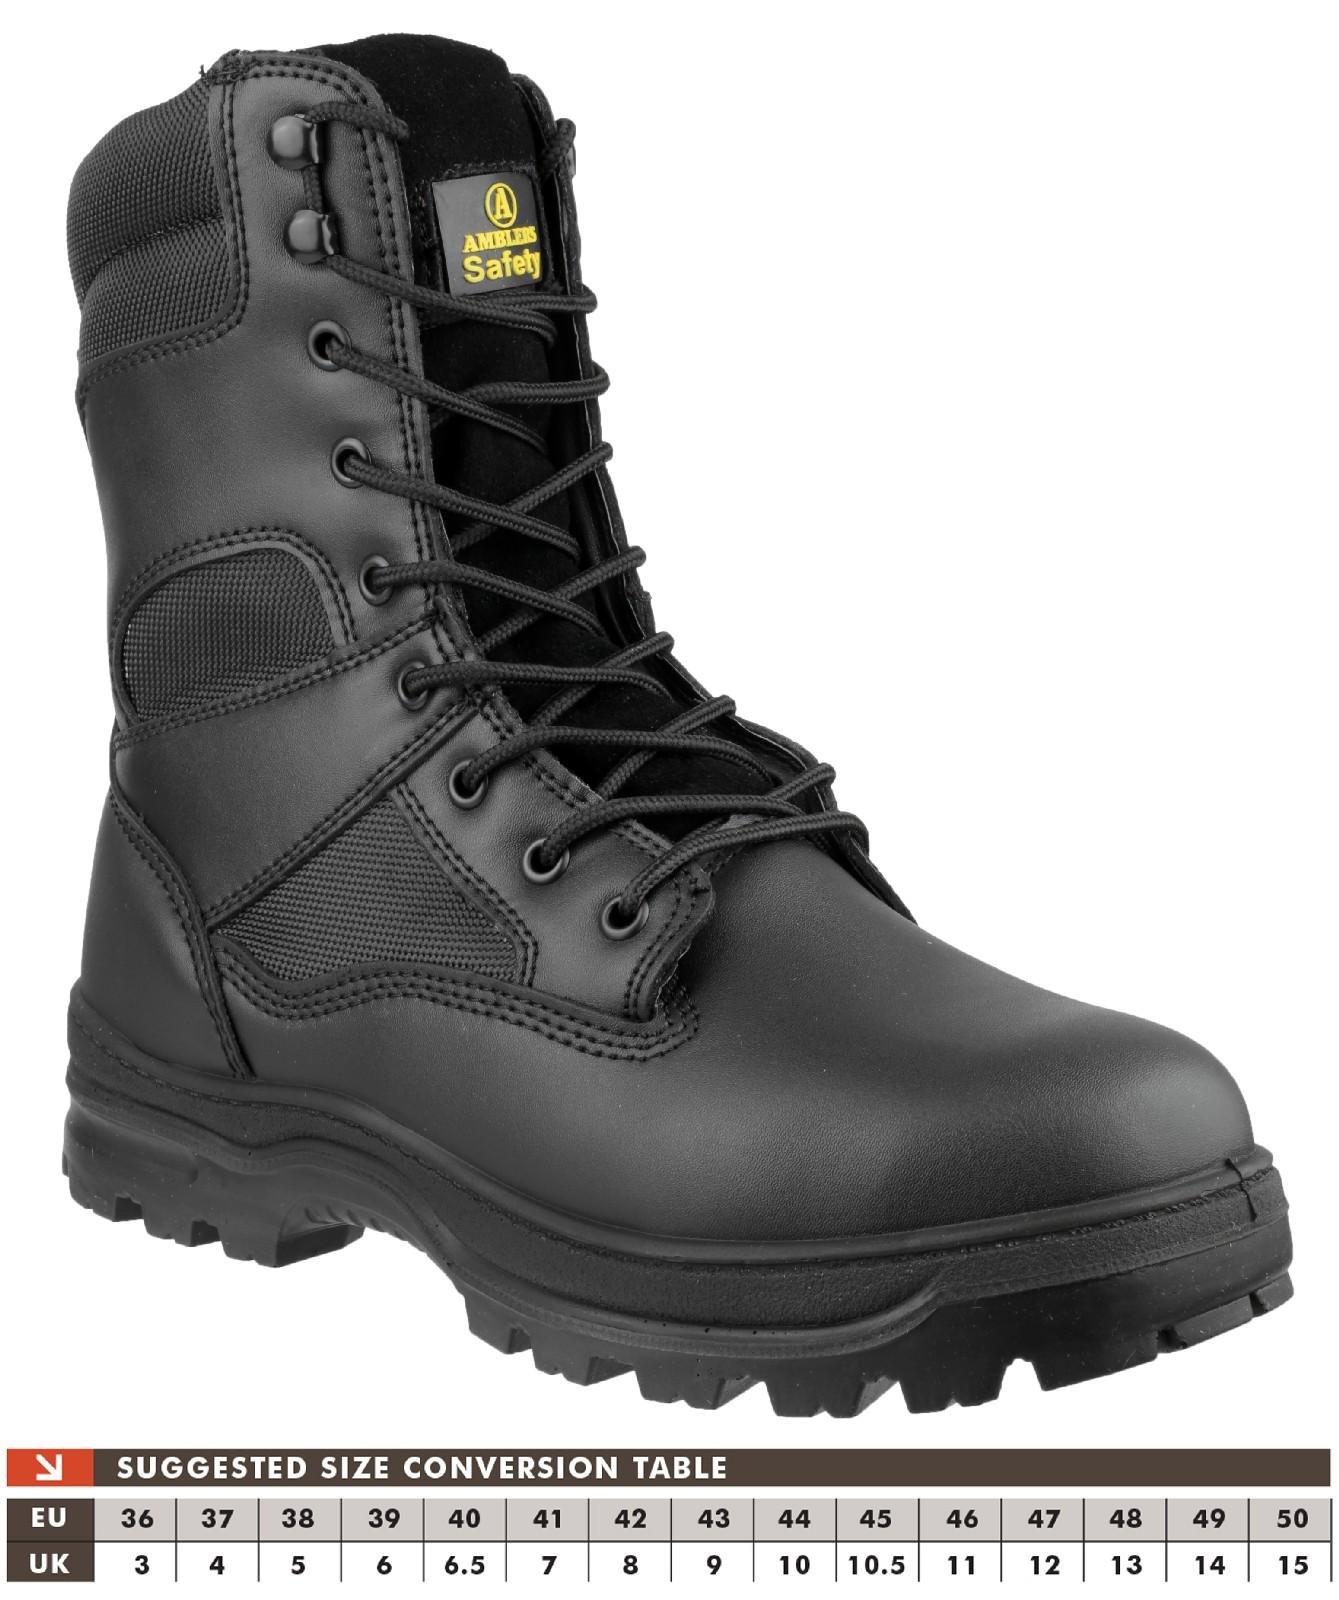 Amblers Safety FS008 S3 Side Zip Hi-Boot Black Size 42 C014xxQ5